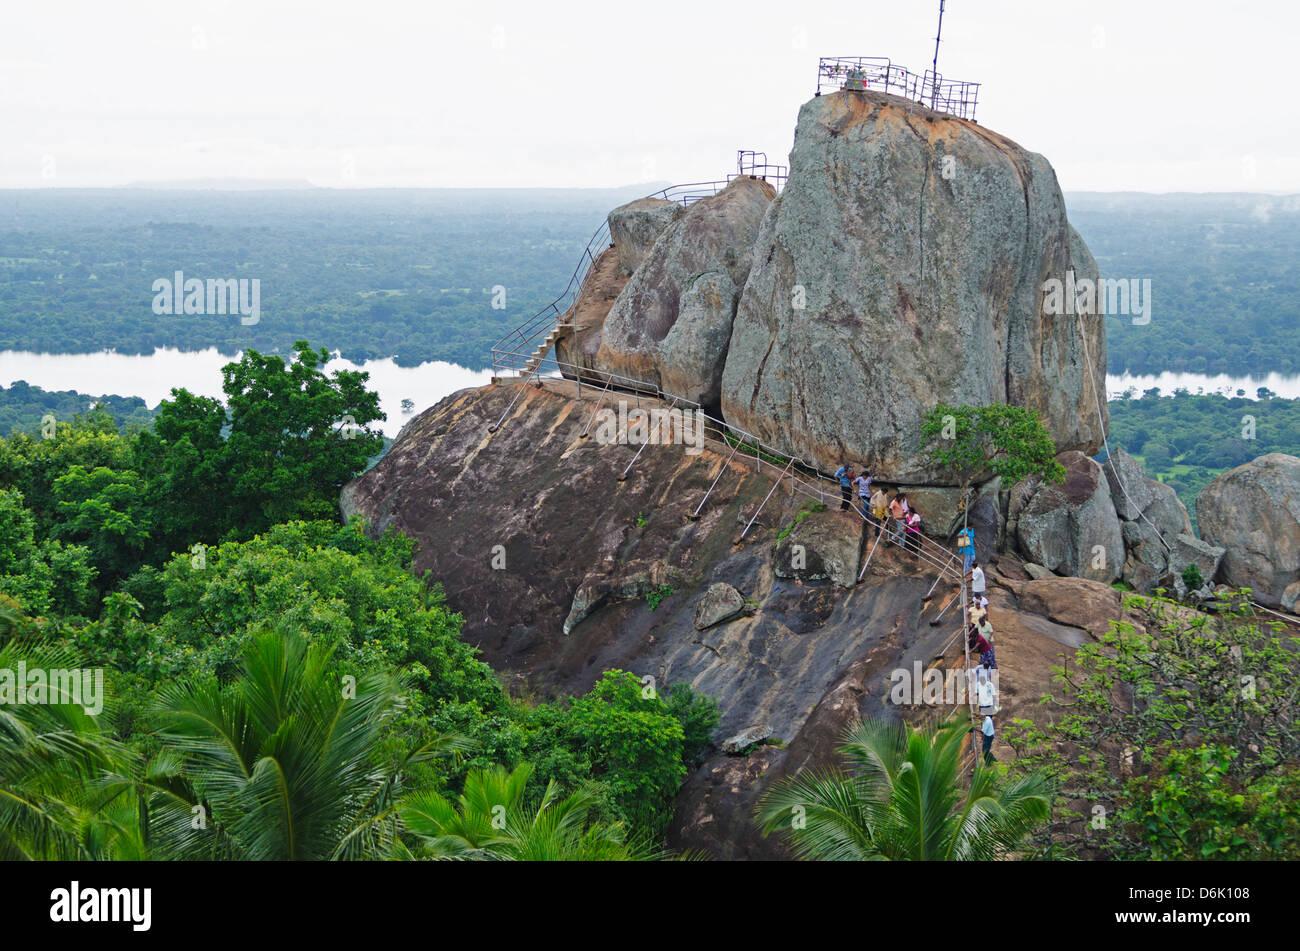 Mihintale, Sri Lanka, Asia - Stock Image